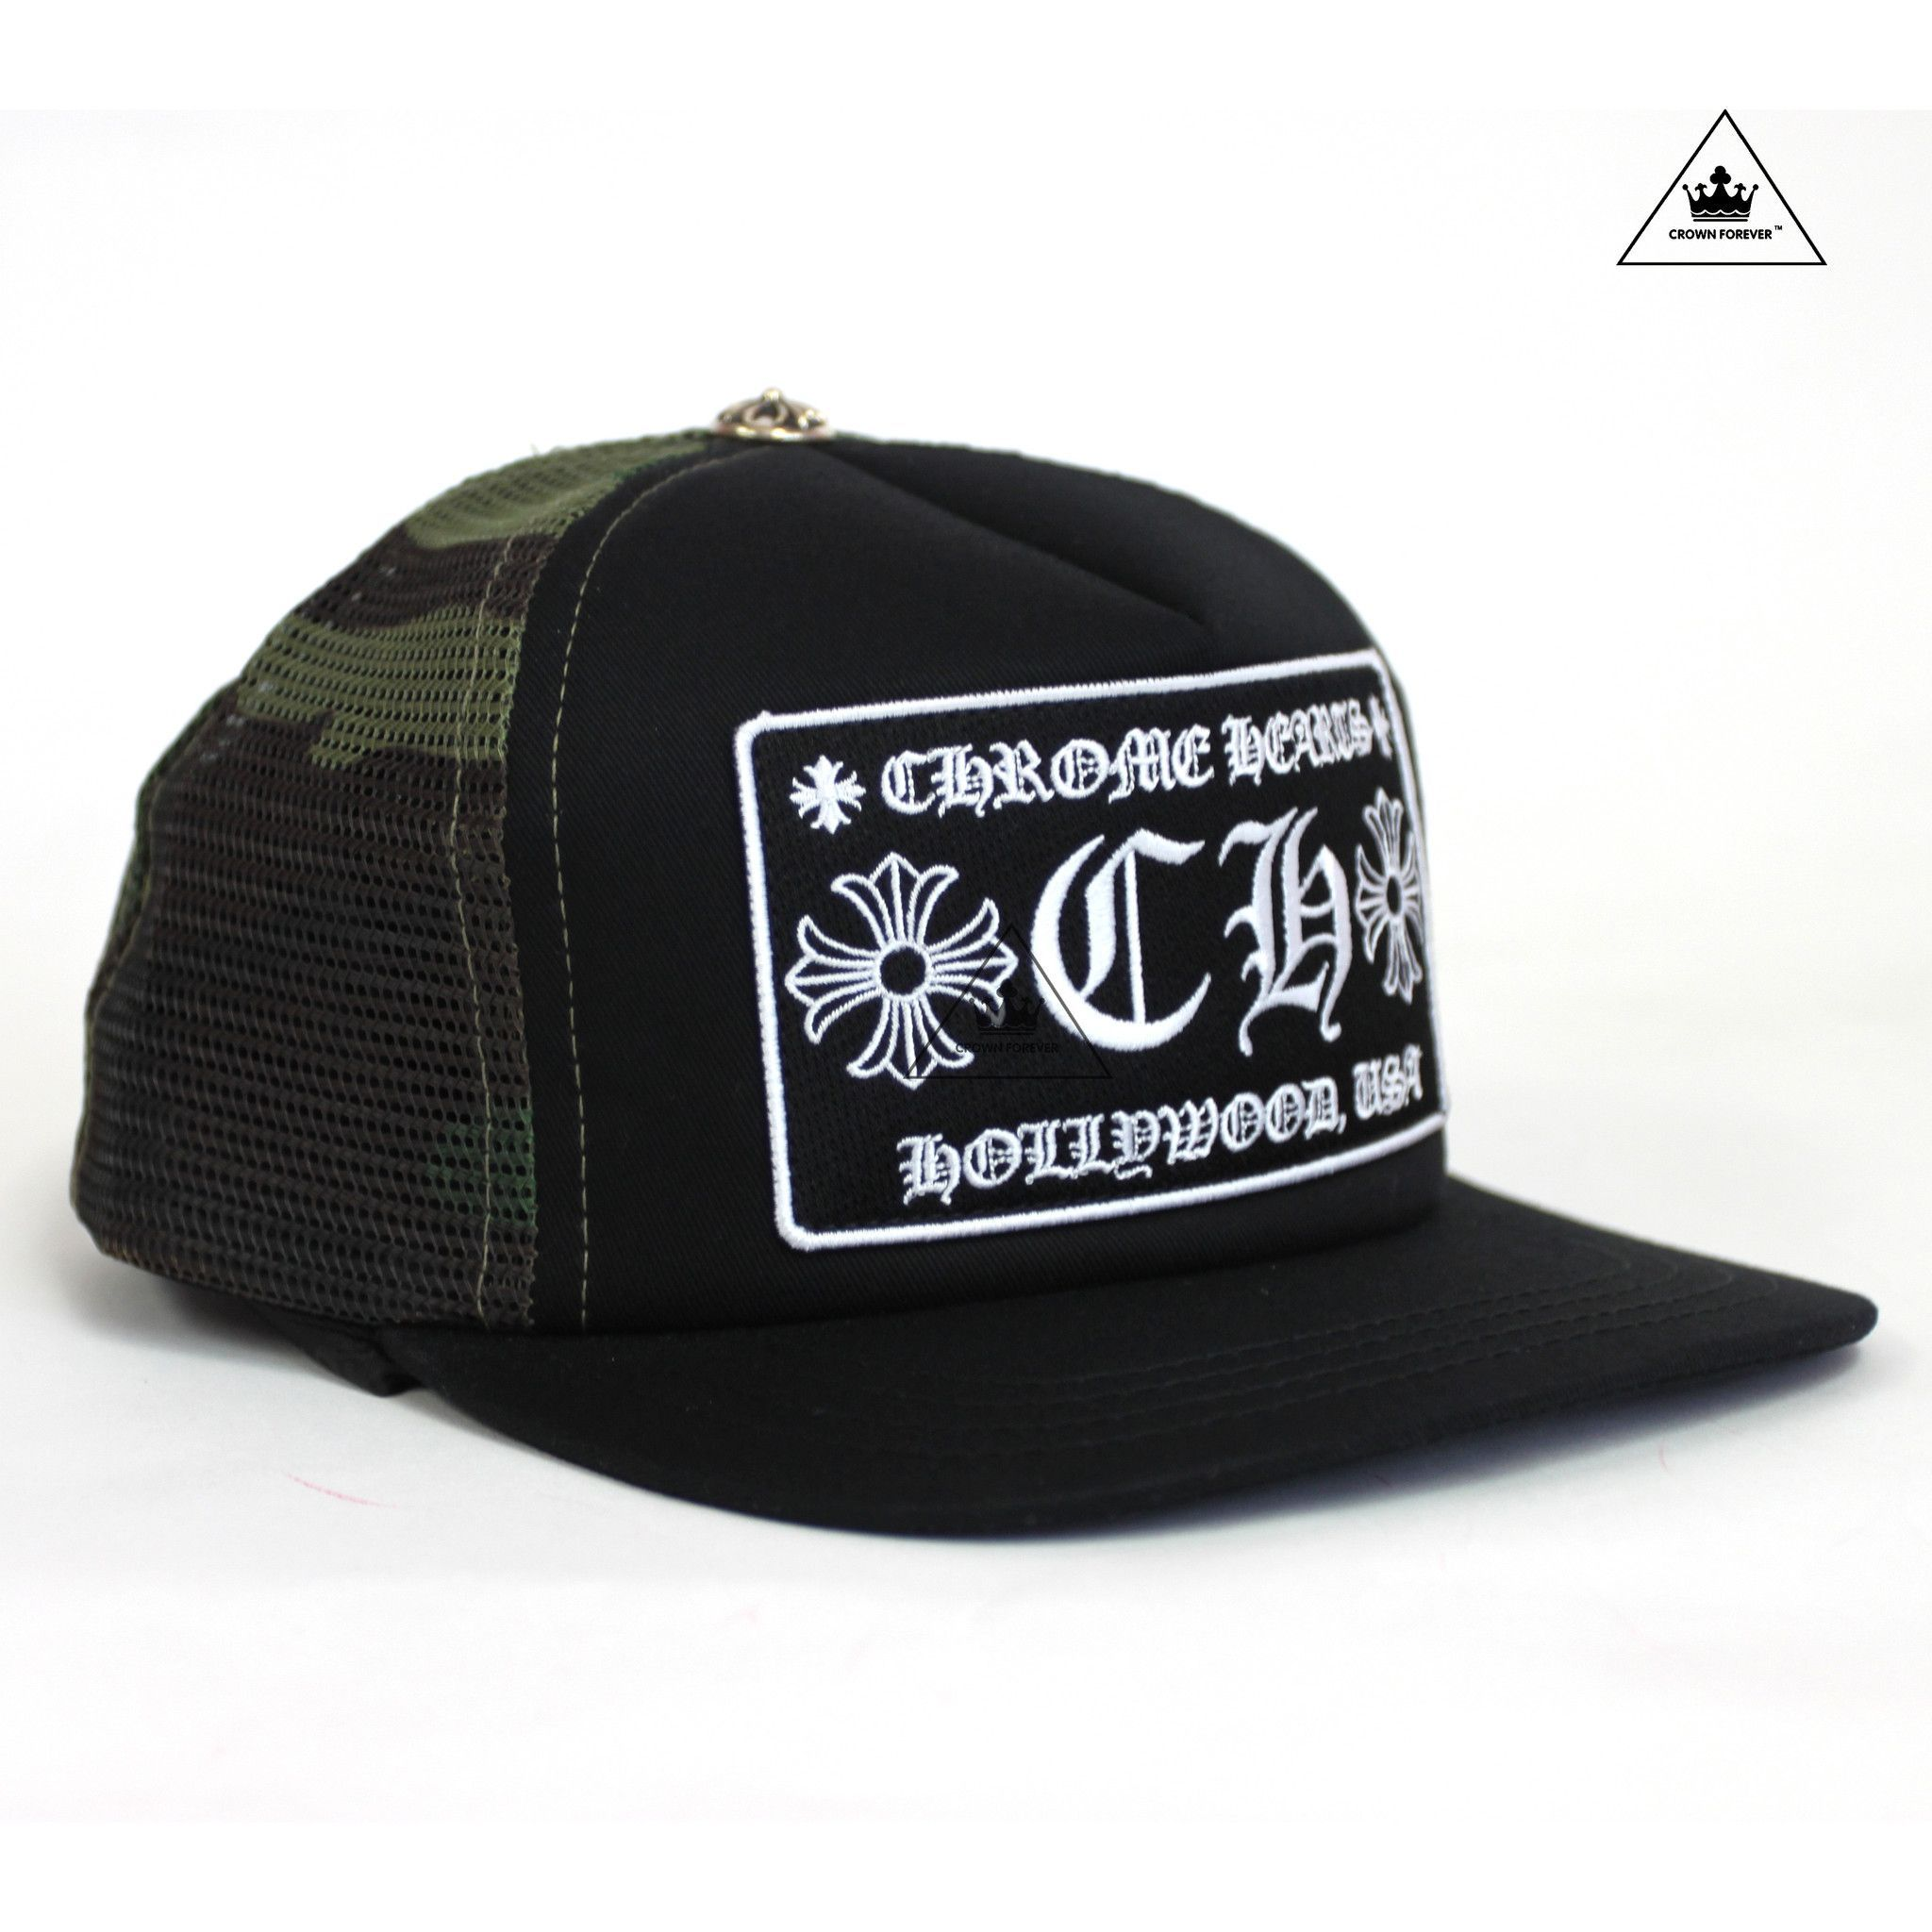 1de6805a5 CH Hollywood Patch Trucker Cap Black/Camo   Chrome Hearts Hats ...